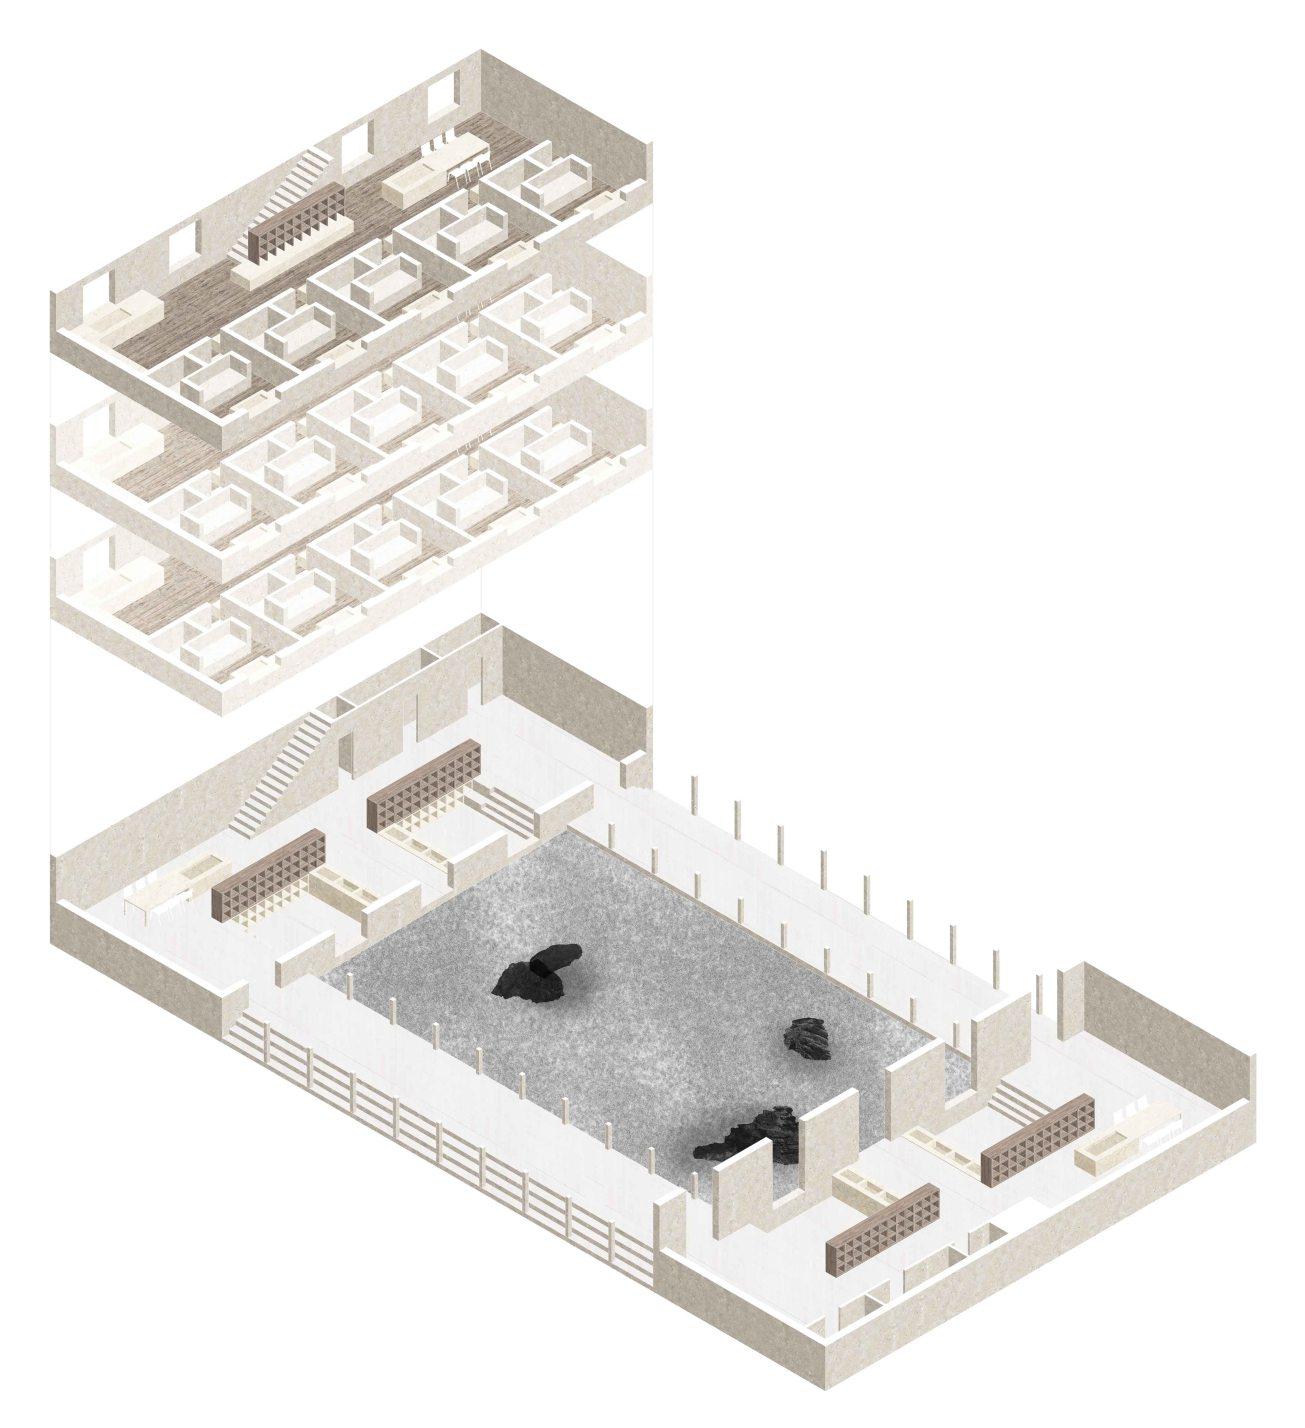 9_isometric view living quarters